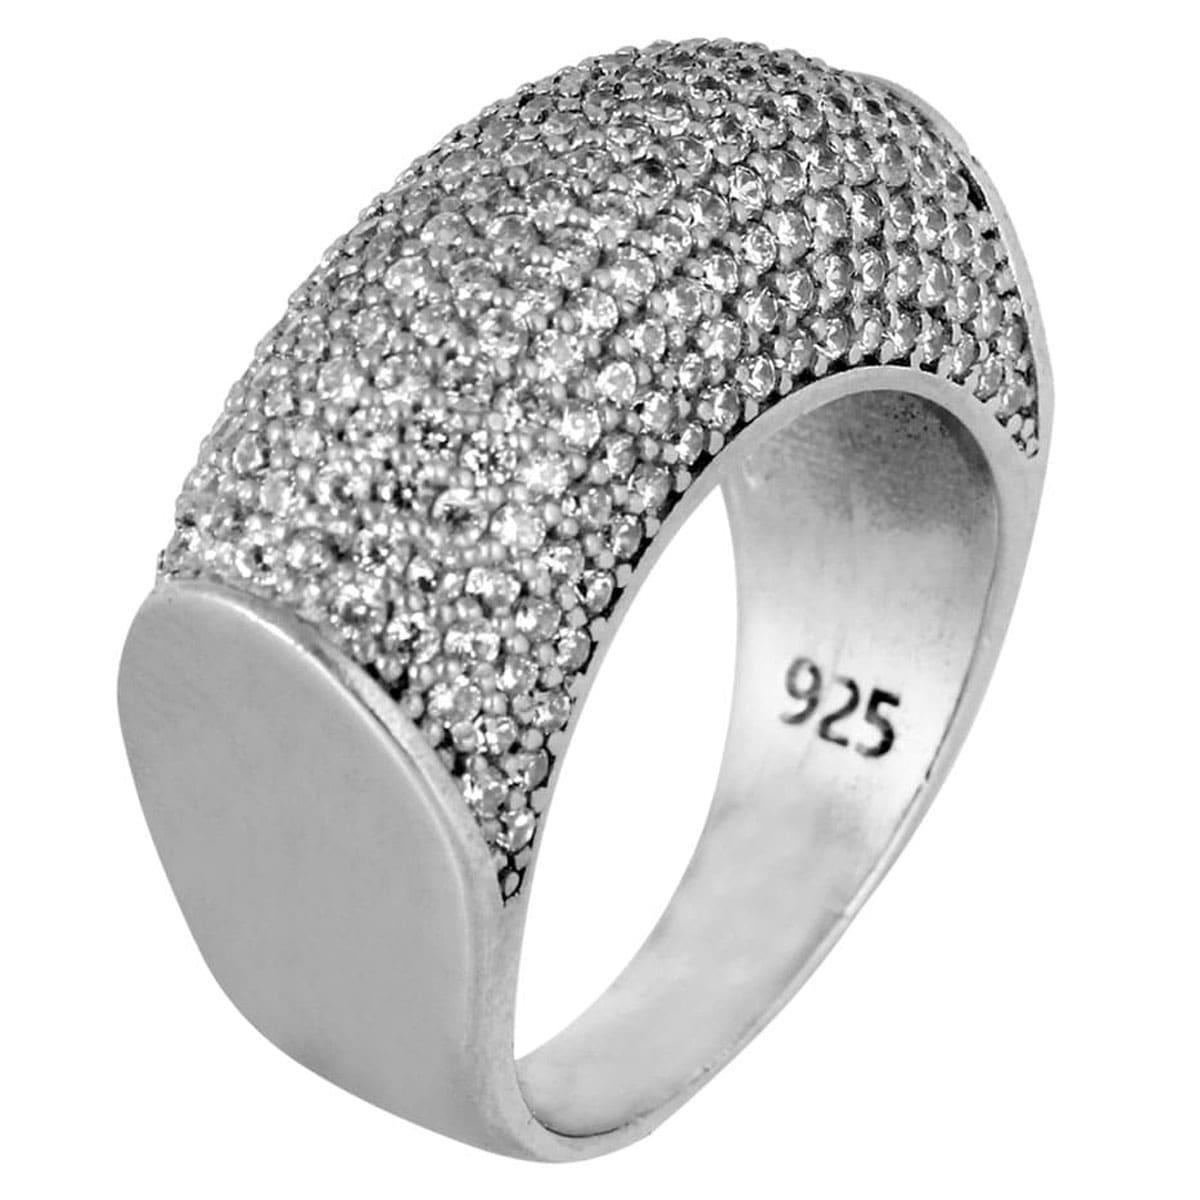 انگشتر نقره مدل Jewel کد ۱۸۰۰۹۷